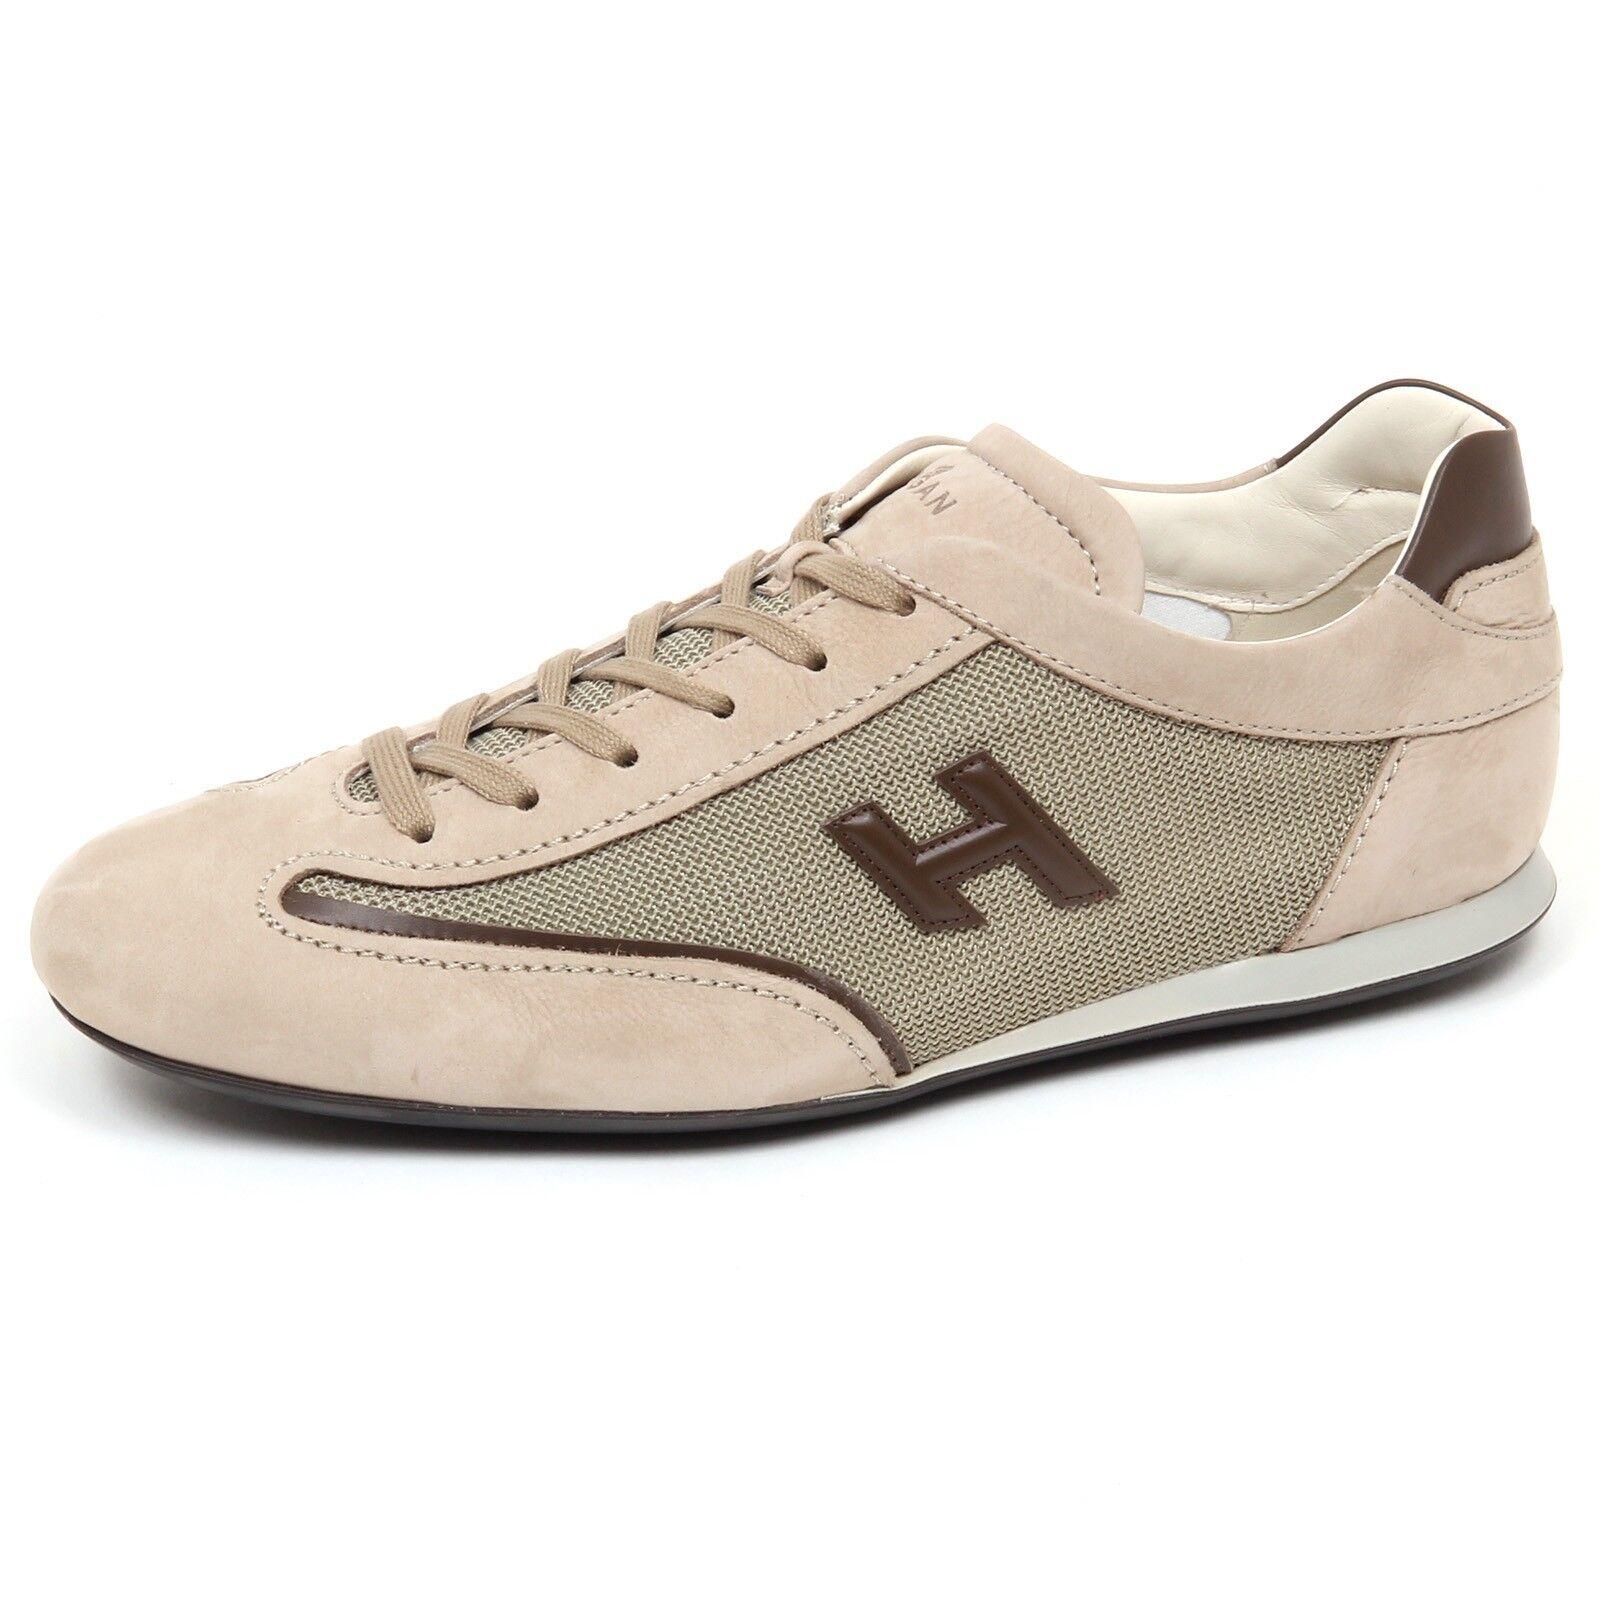 E9820 Mens Trainers Beige marrón HOGAN OLYMPIA SLASH zapatos H 3d zapatos man